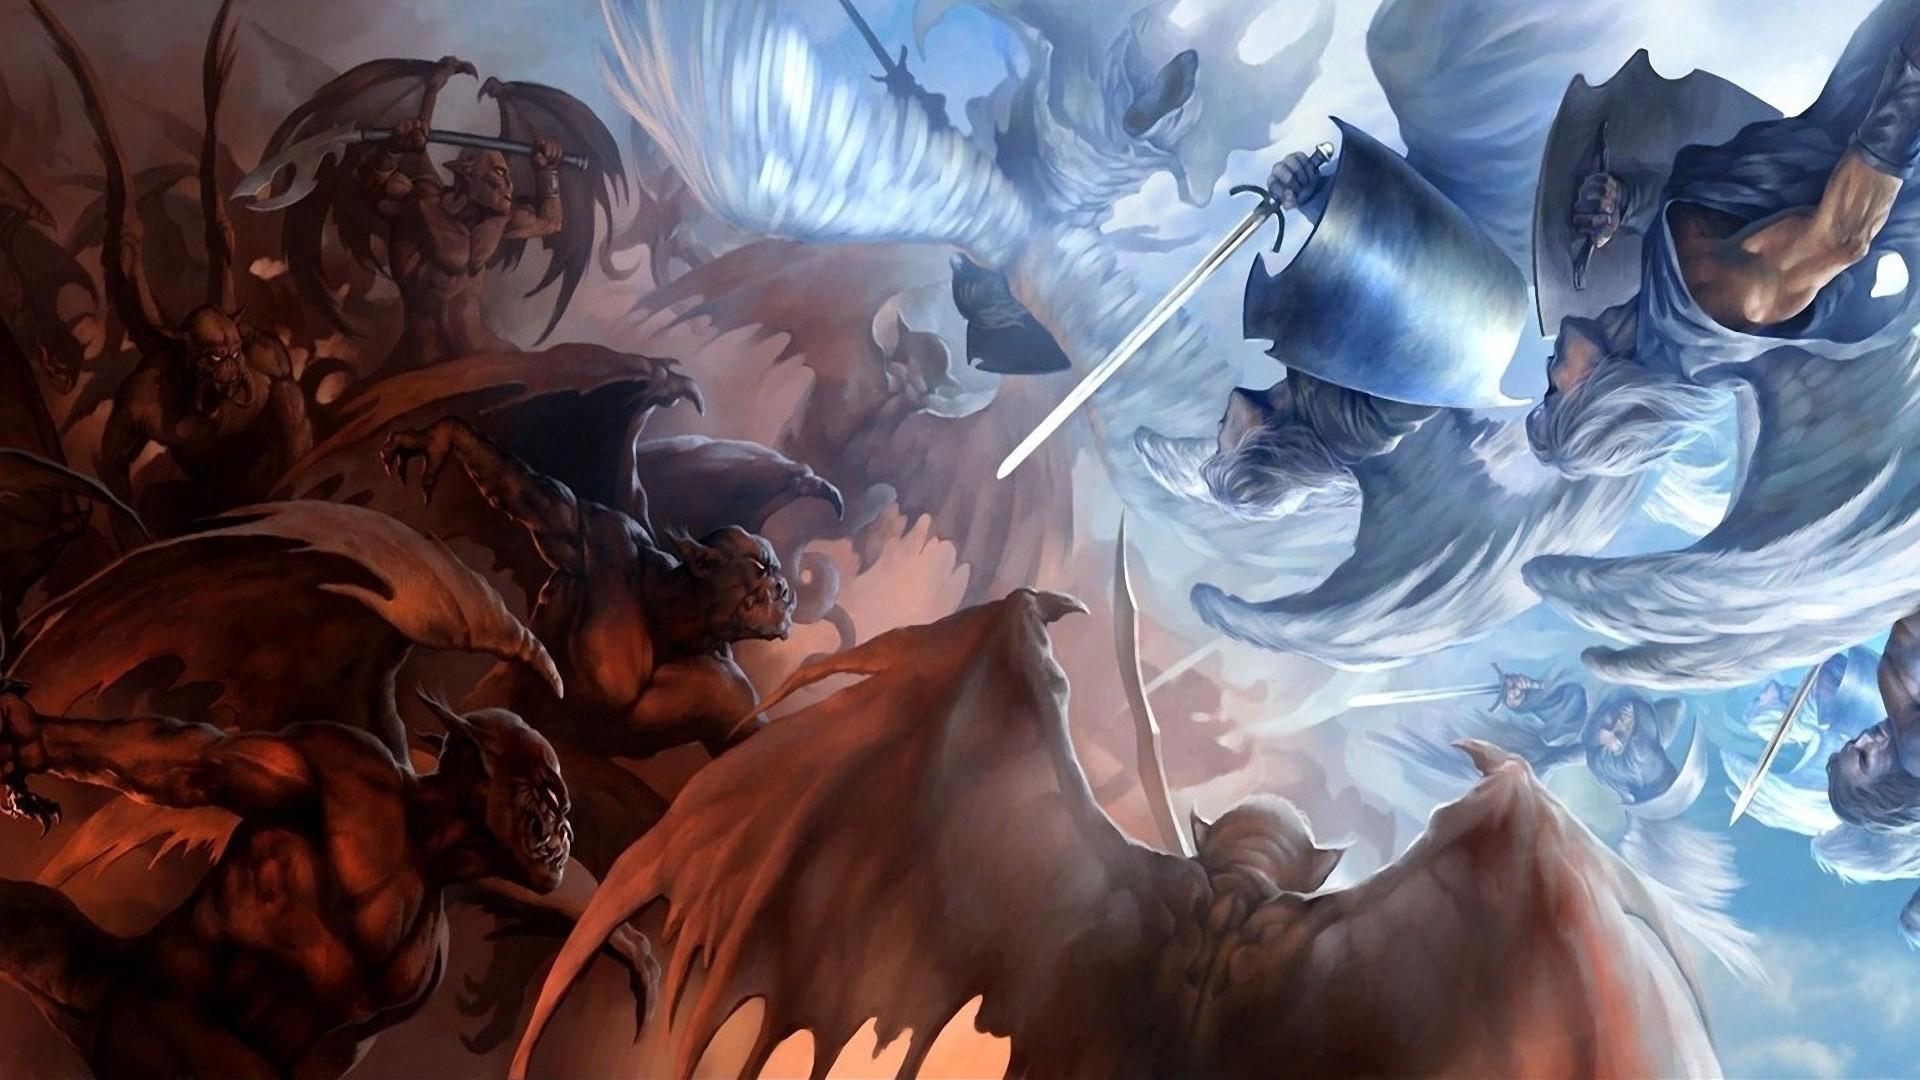 Battle Prayer to Break Legal Rights of Demons – 4 Levels of Spiritual  Warfare Against Demonic